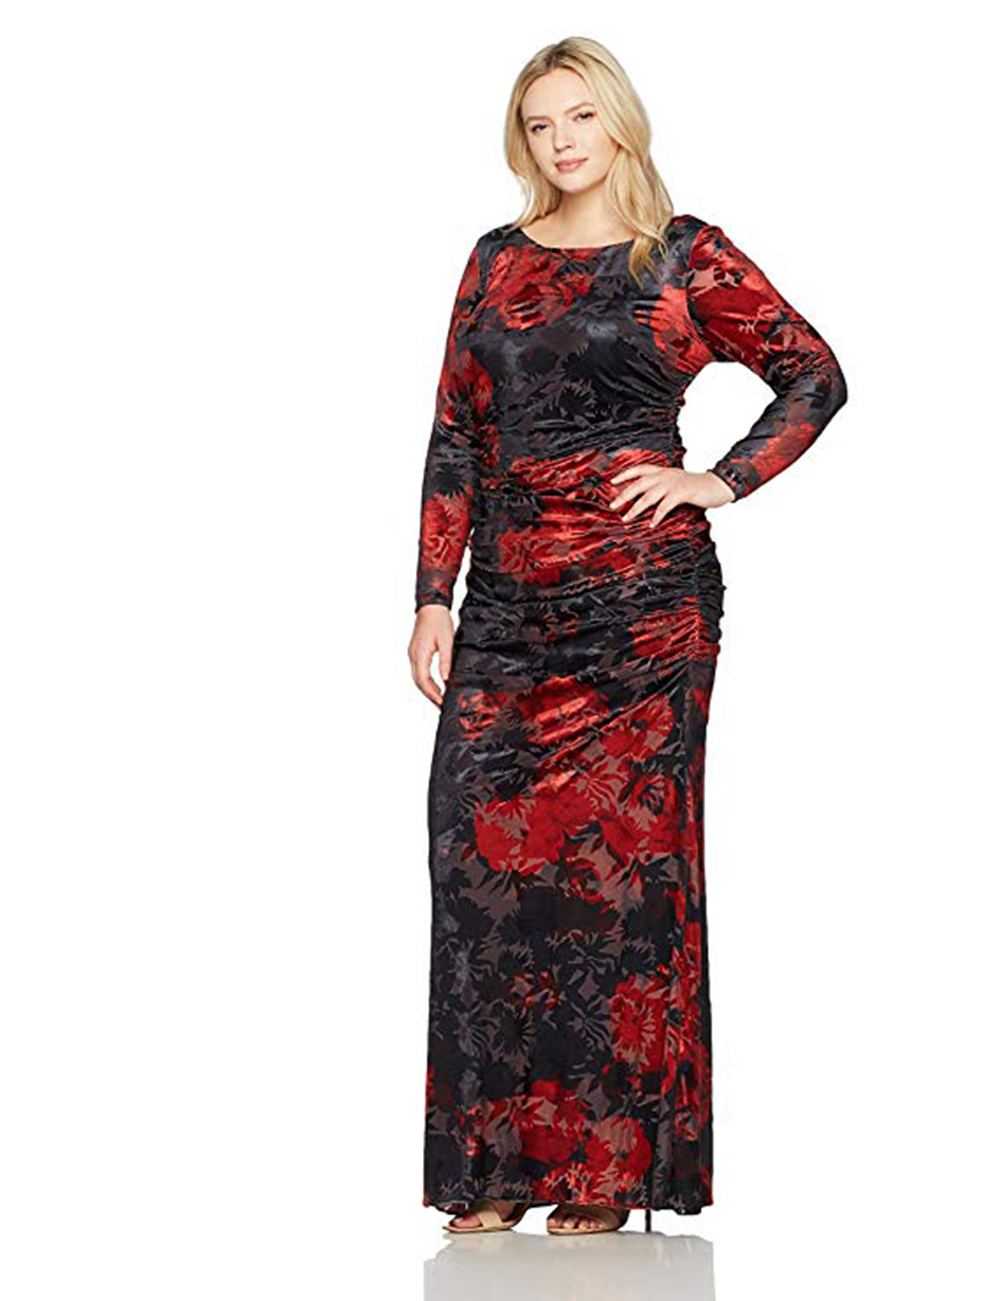 f93060210eba Adrianna Papell Velvet Burnout Floral Gown, Cardinal/Black, 14W ...